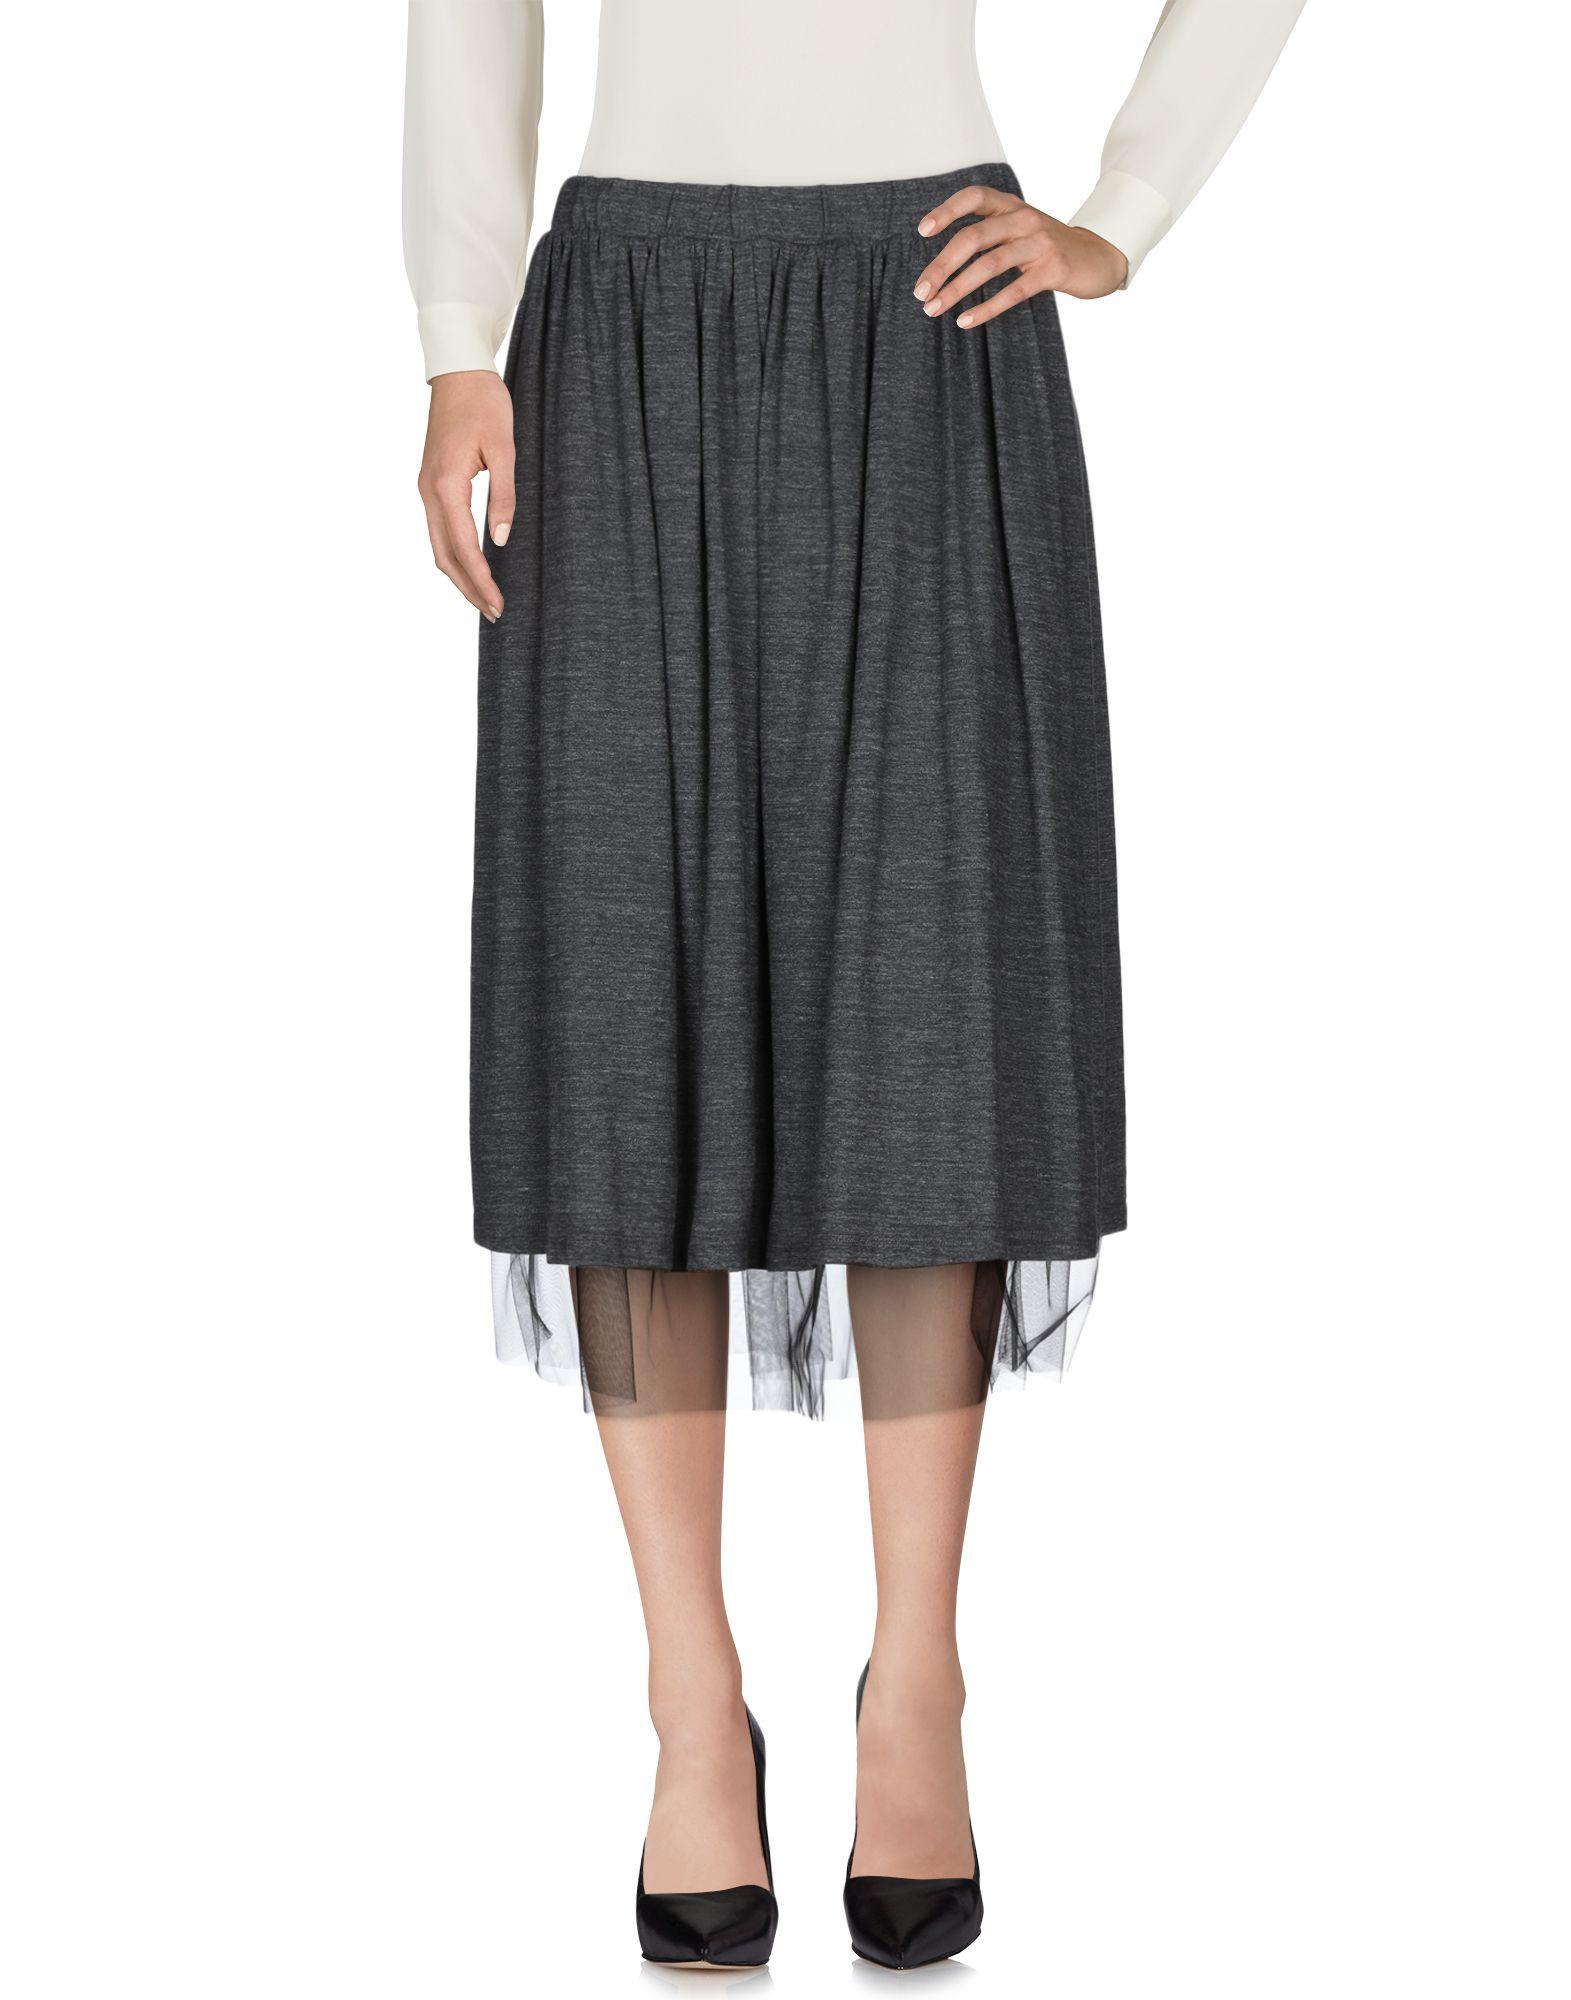 TWIN-SET JEANS Юбка длиной 3/4 trussardi jeans юбка длиной 3 4